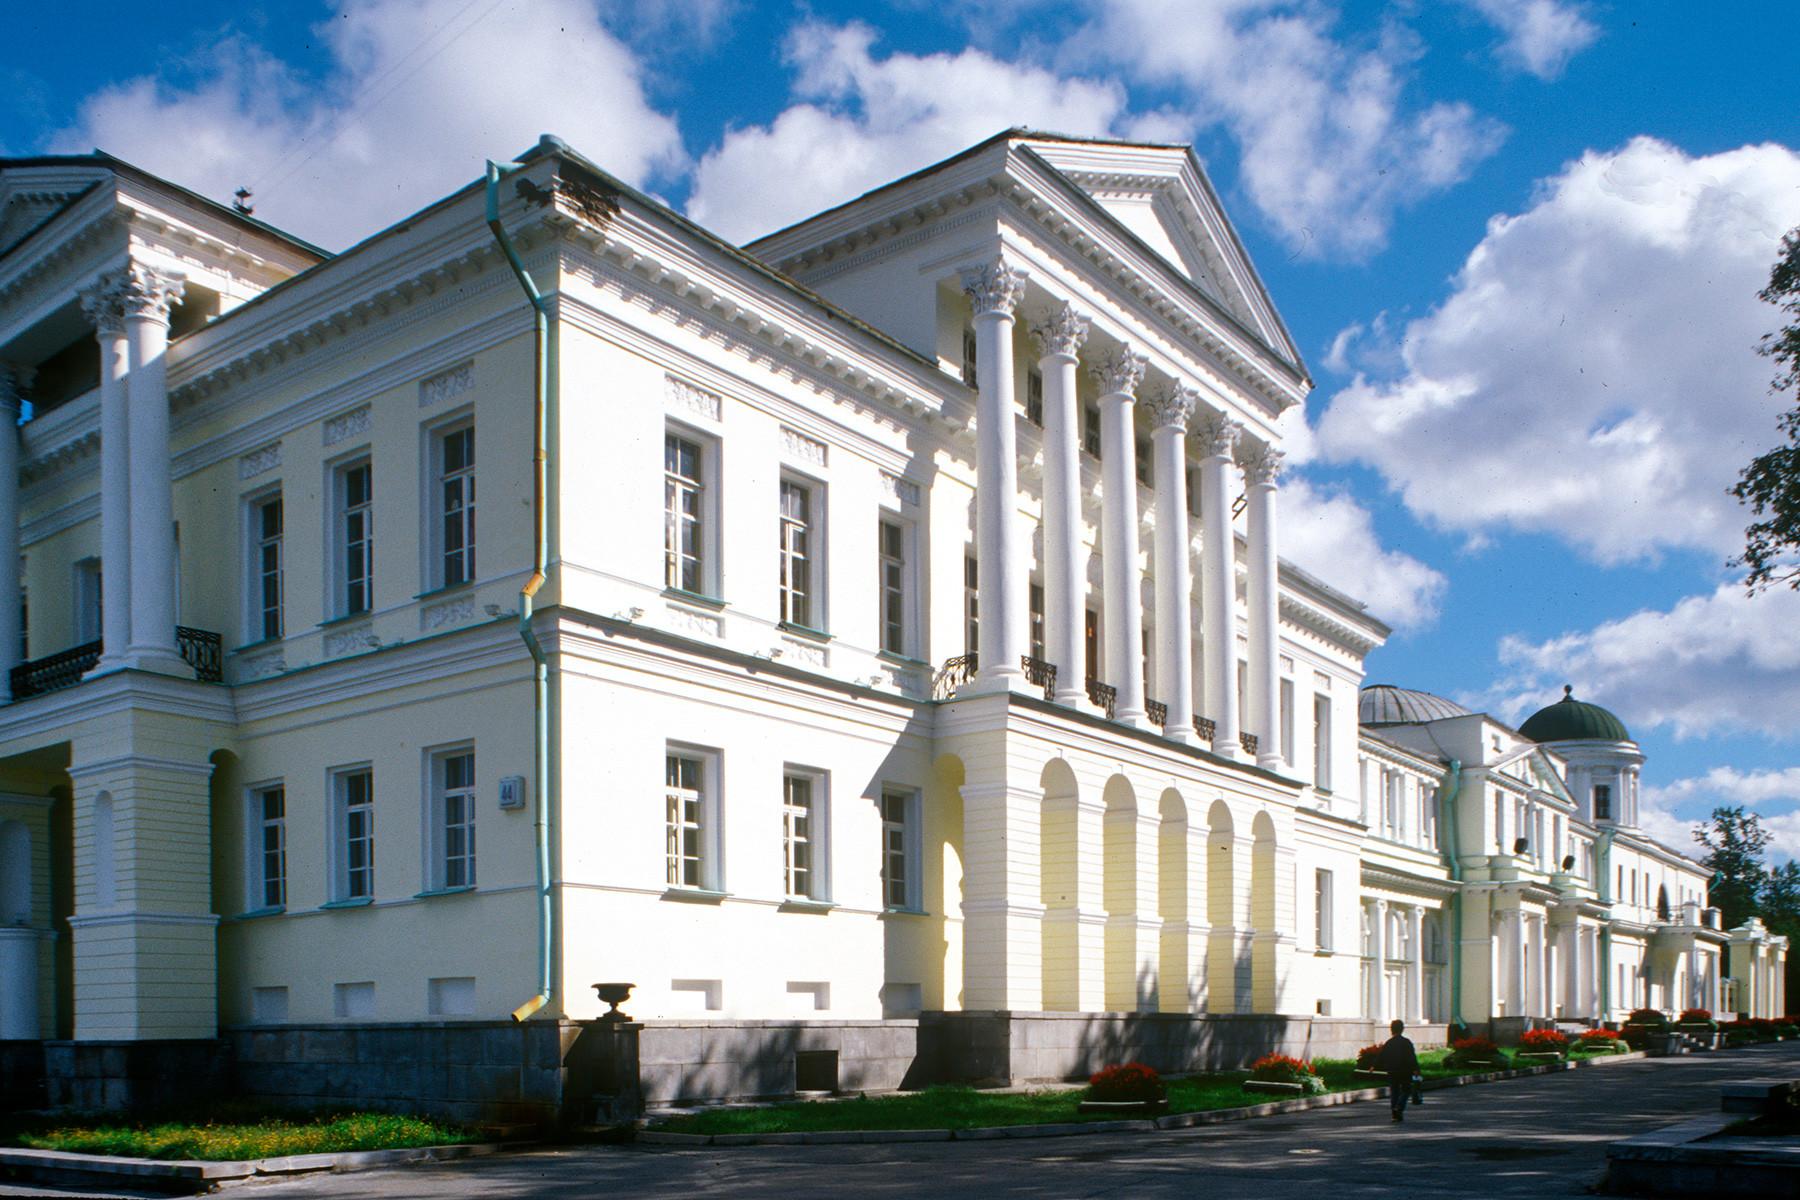 Palazzo Rastorguev-Kharitonov, facciata principale. 26 agosto 1999